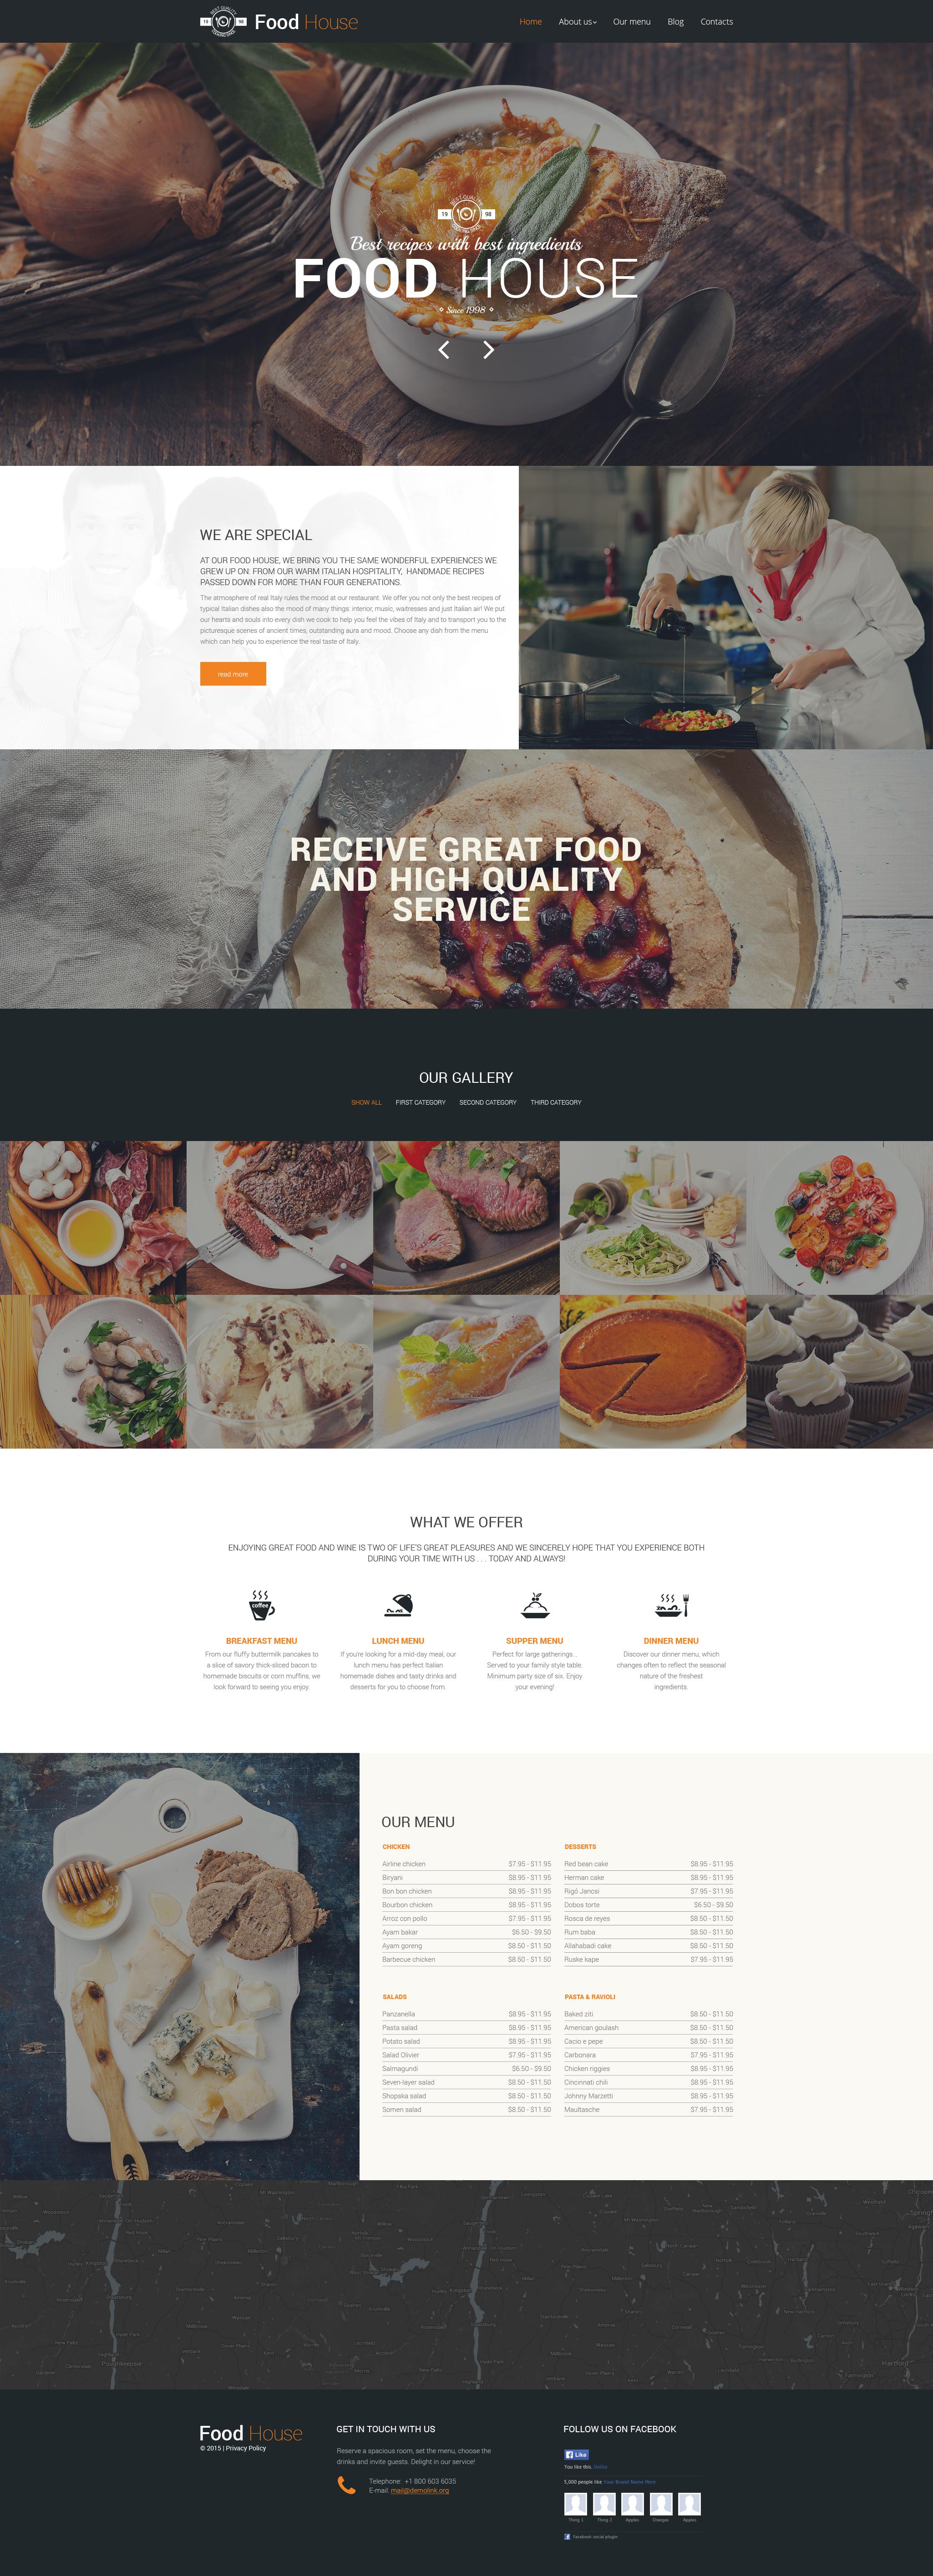 Reszponzív Food House Drupal sablon 57611